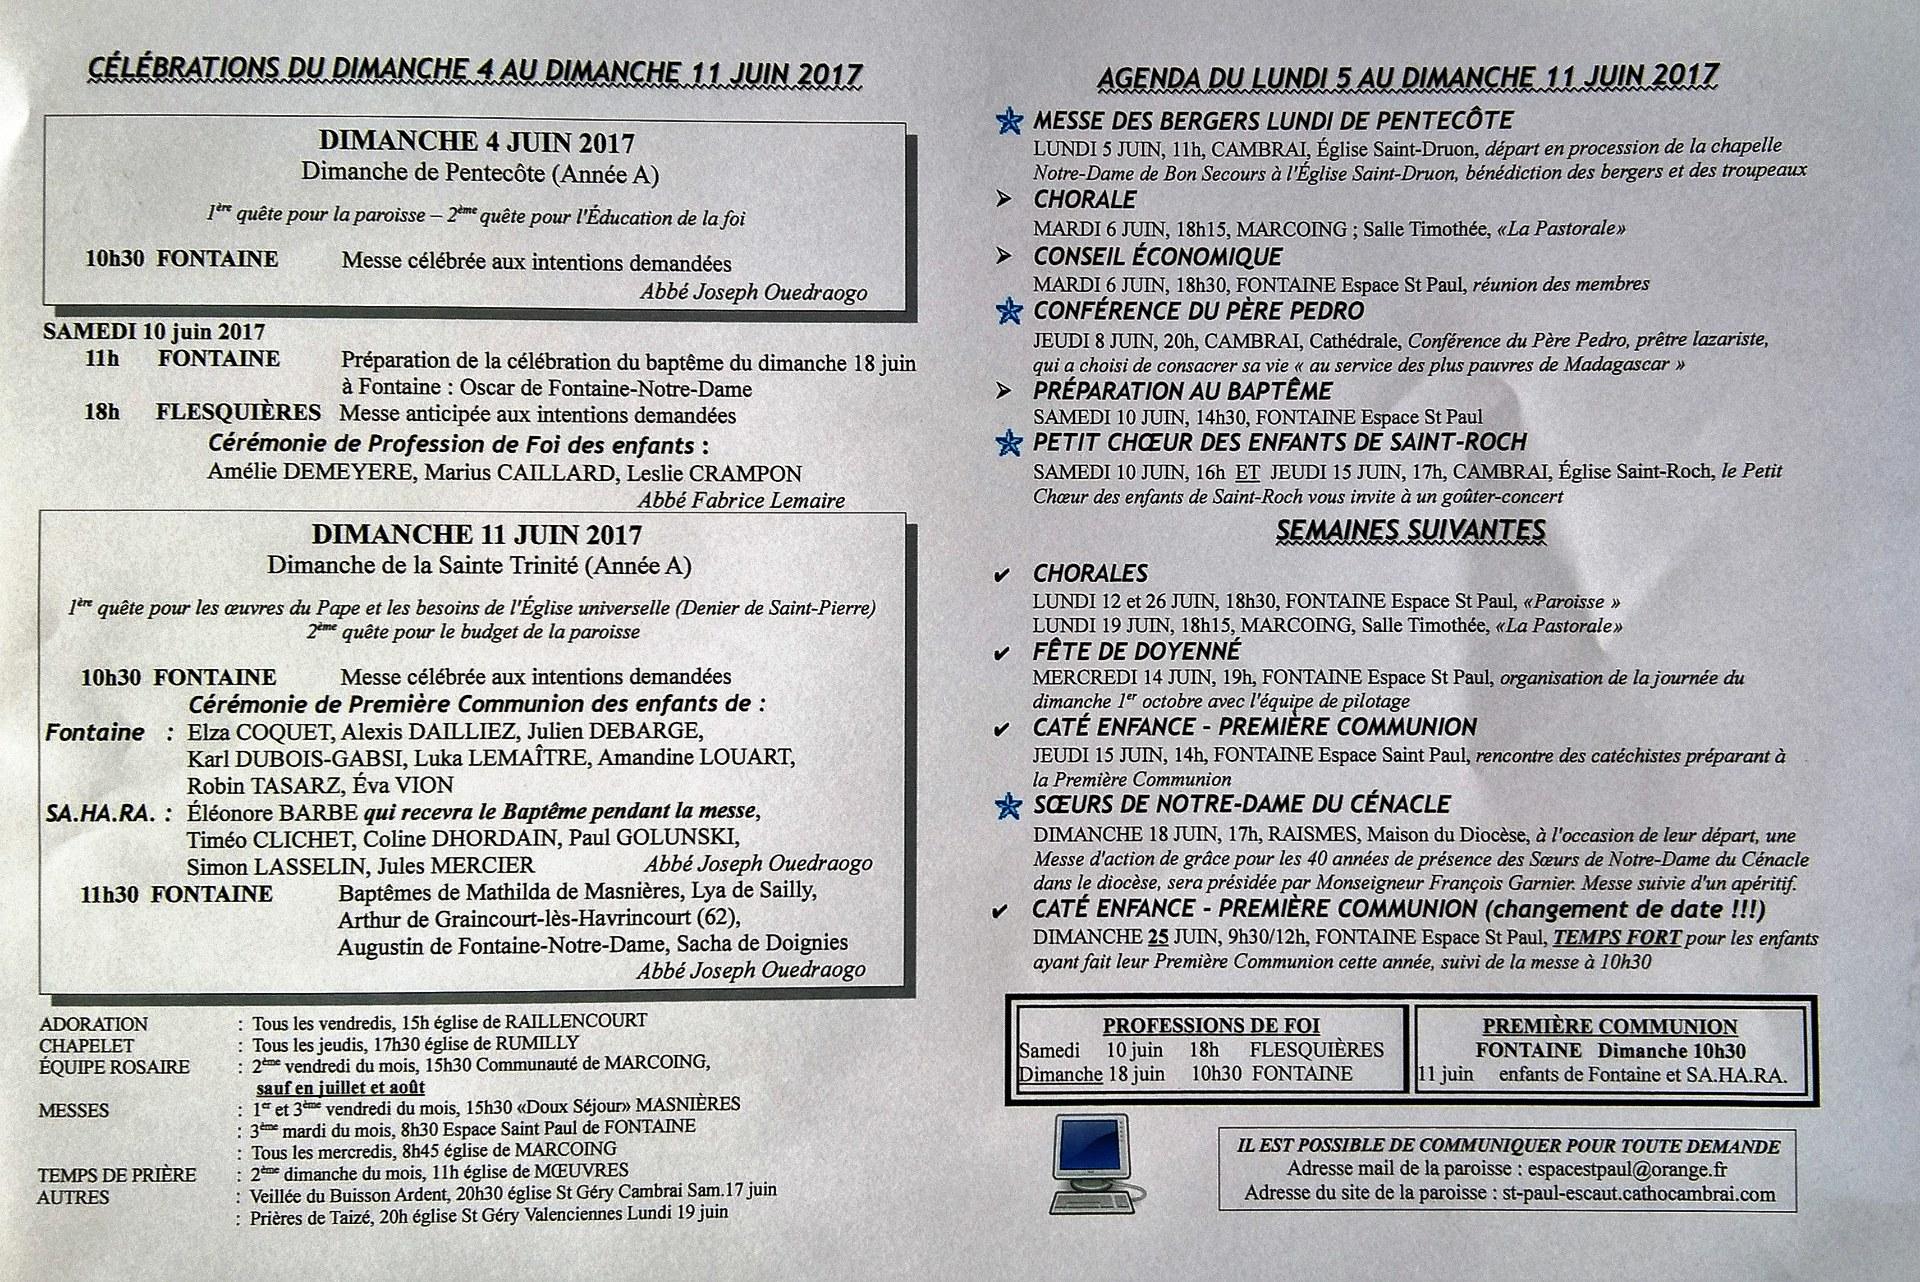 Verso FH 04 06 17